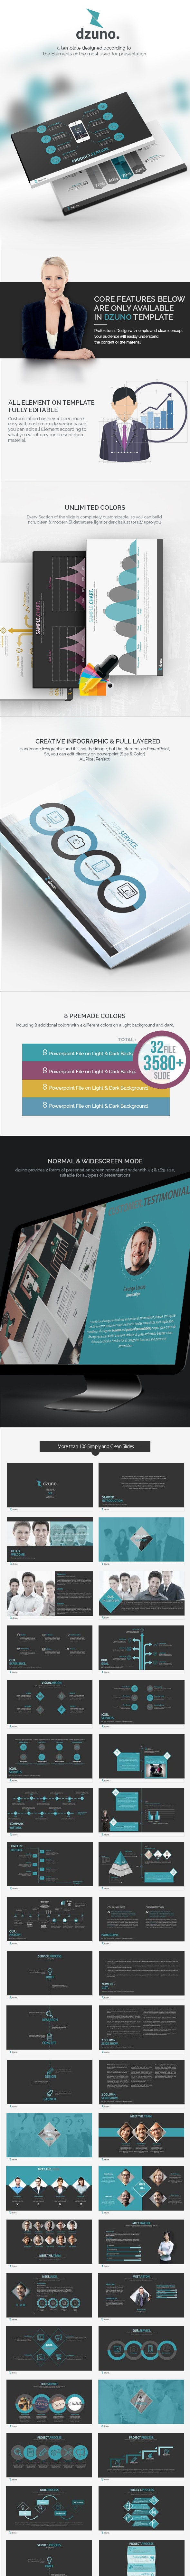 Dzuno - Ready Set World Powerpoint Template - Business PowerPoint Templates